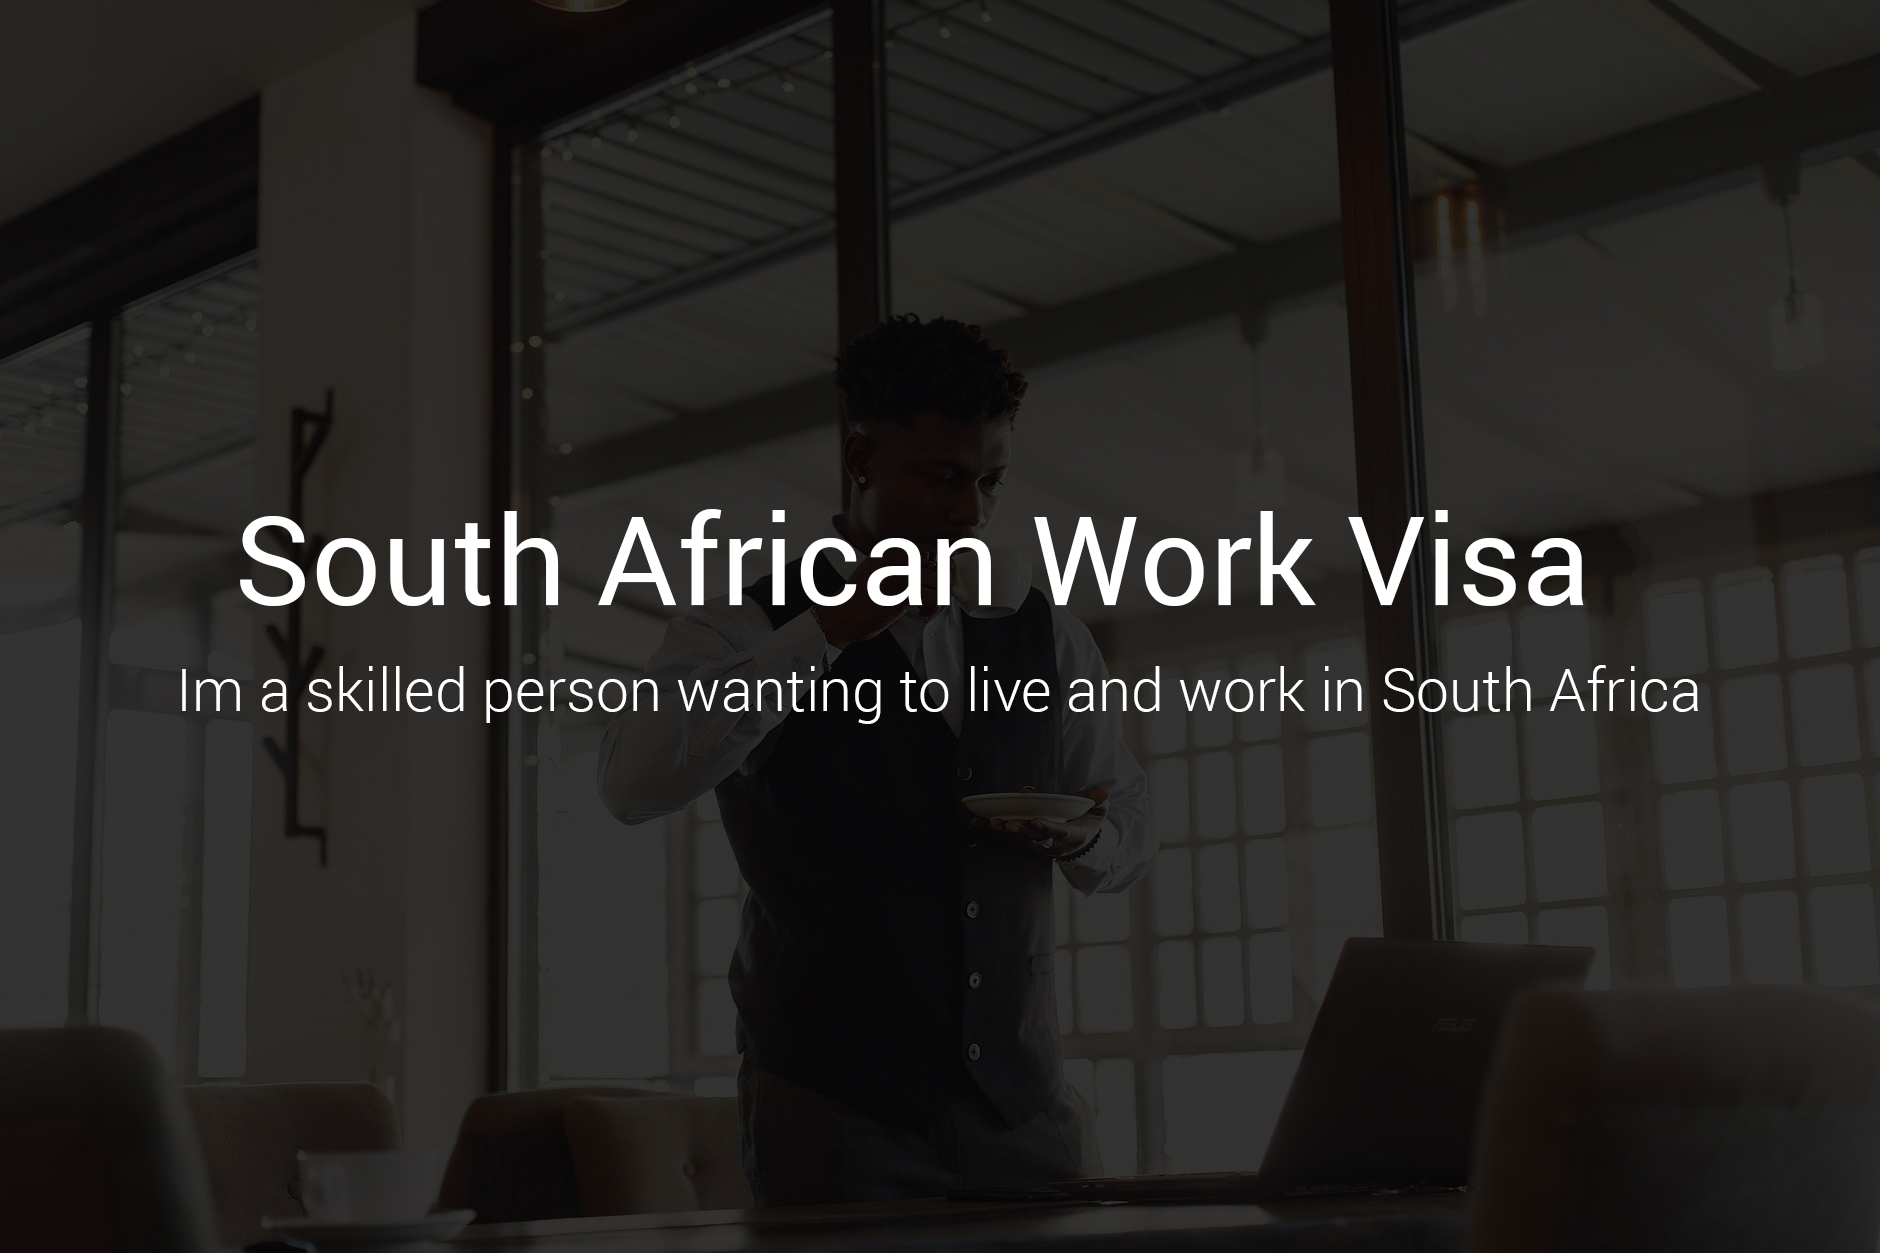 SOUTH AFRICAN WORK VISA